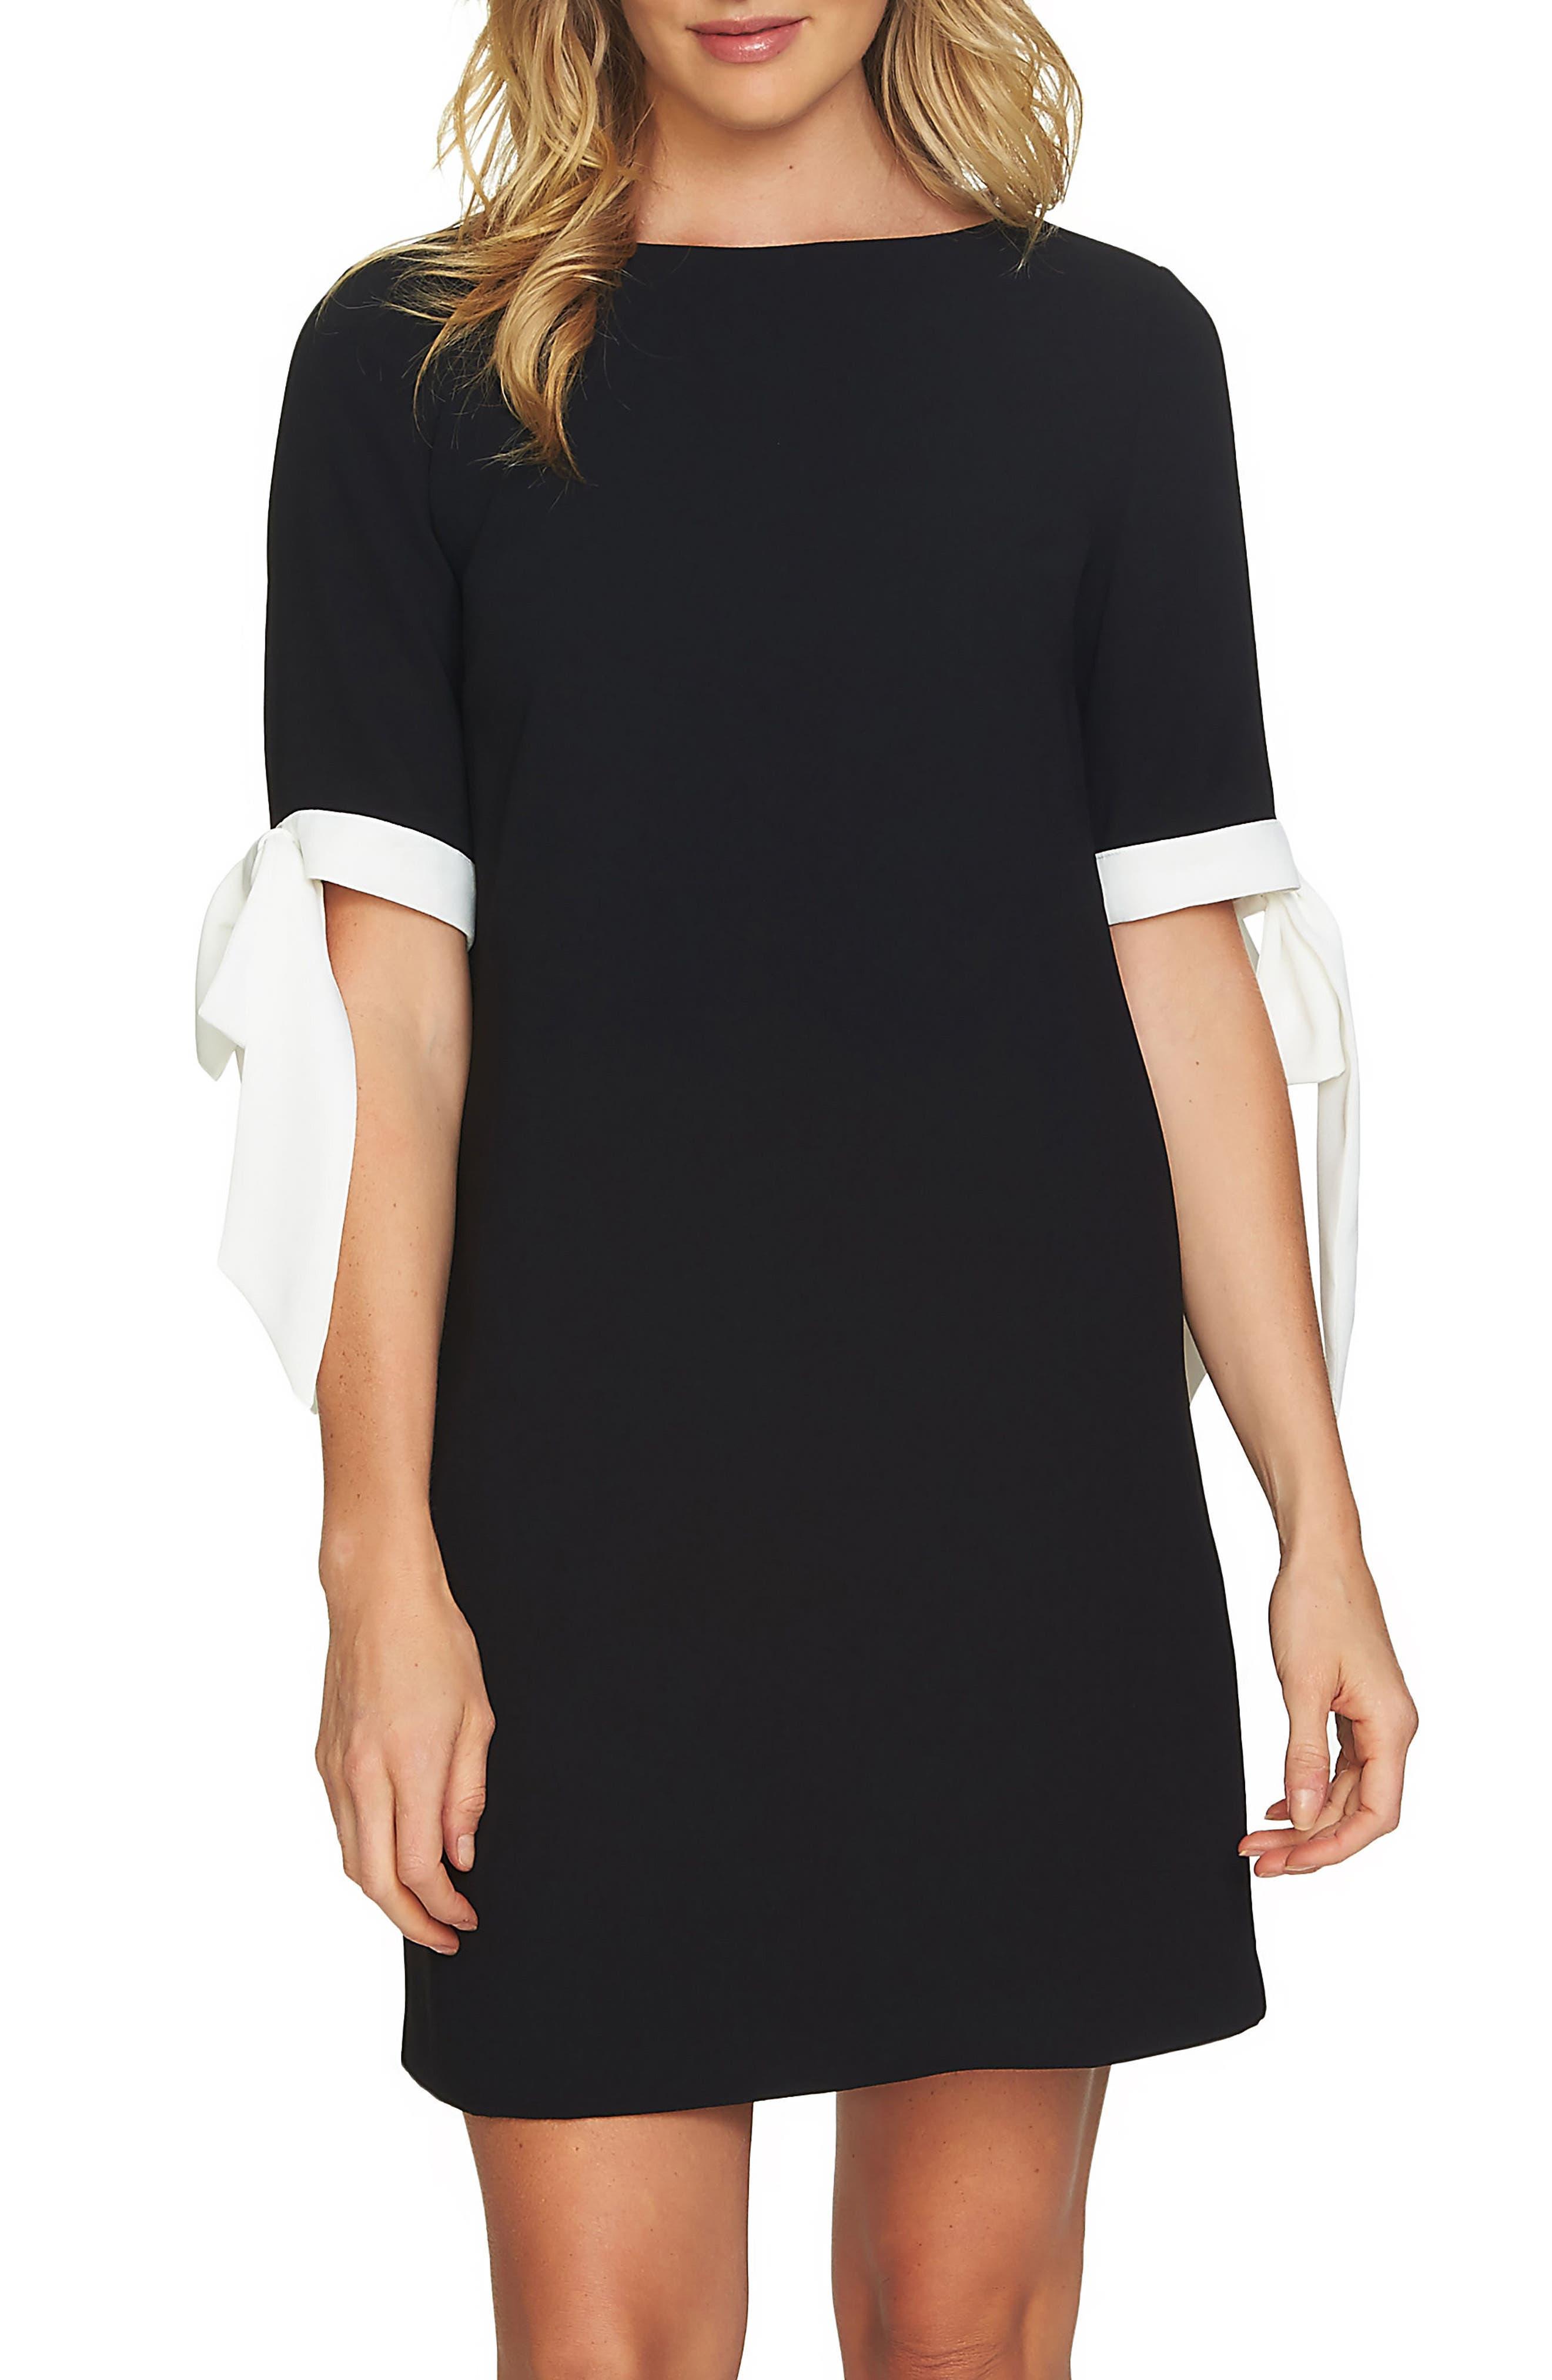 Moss Crepe Shift Dress,                         Main,                         color, 006